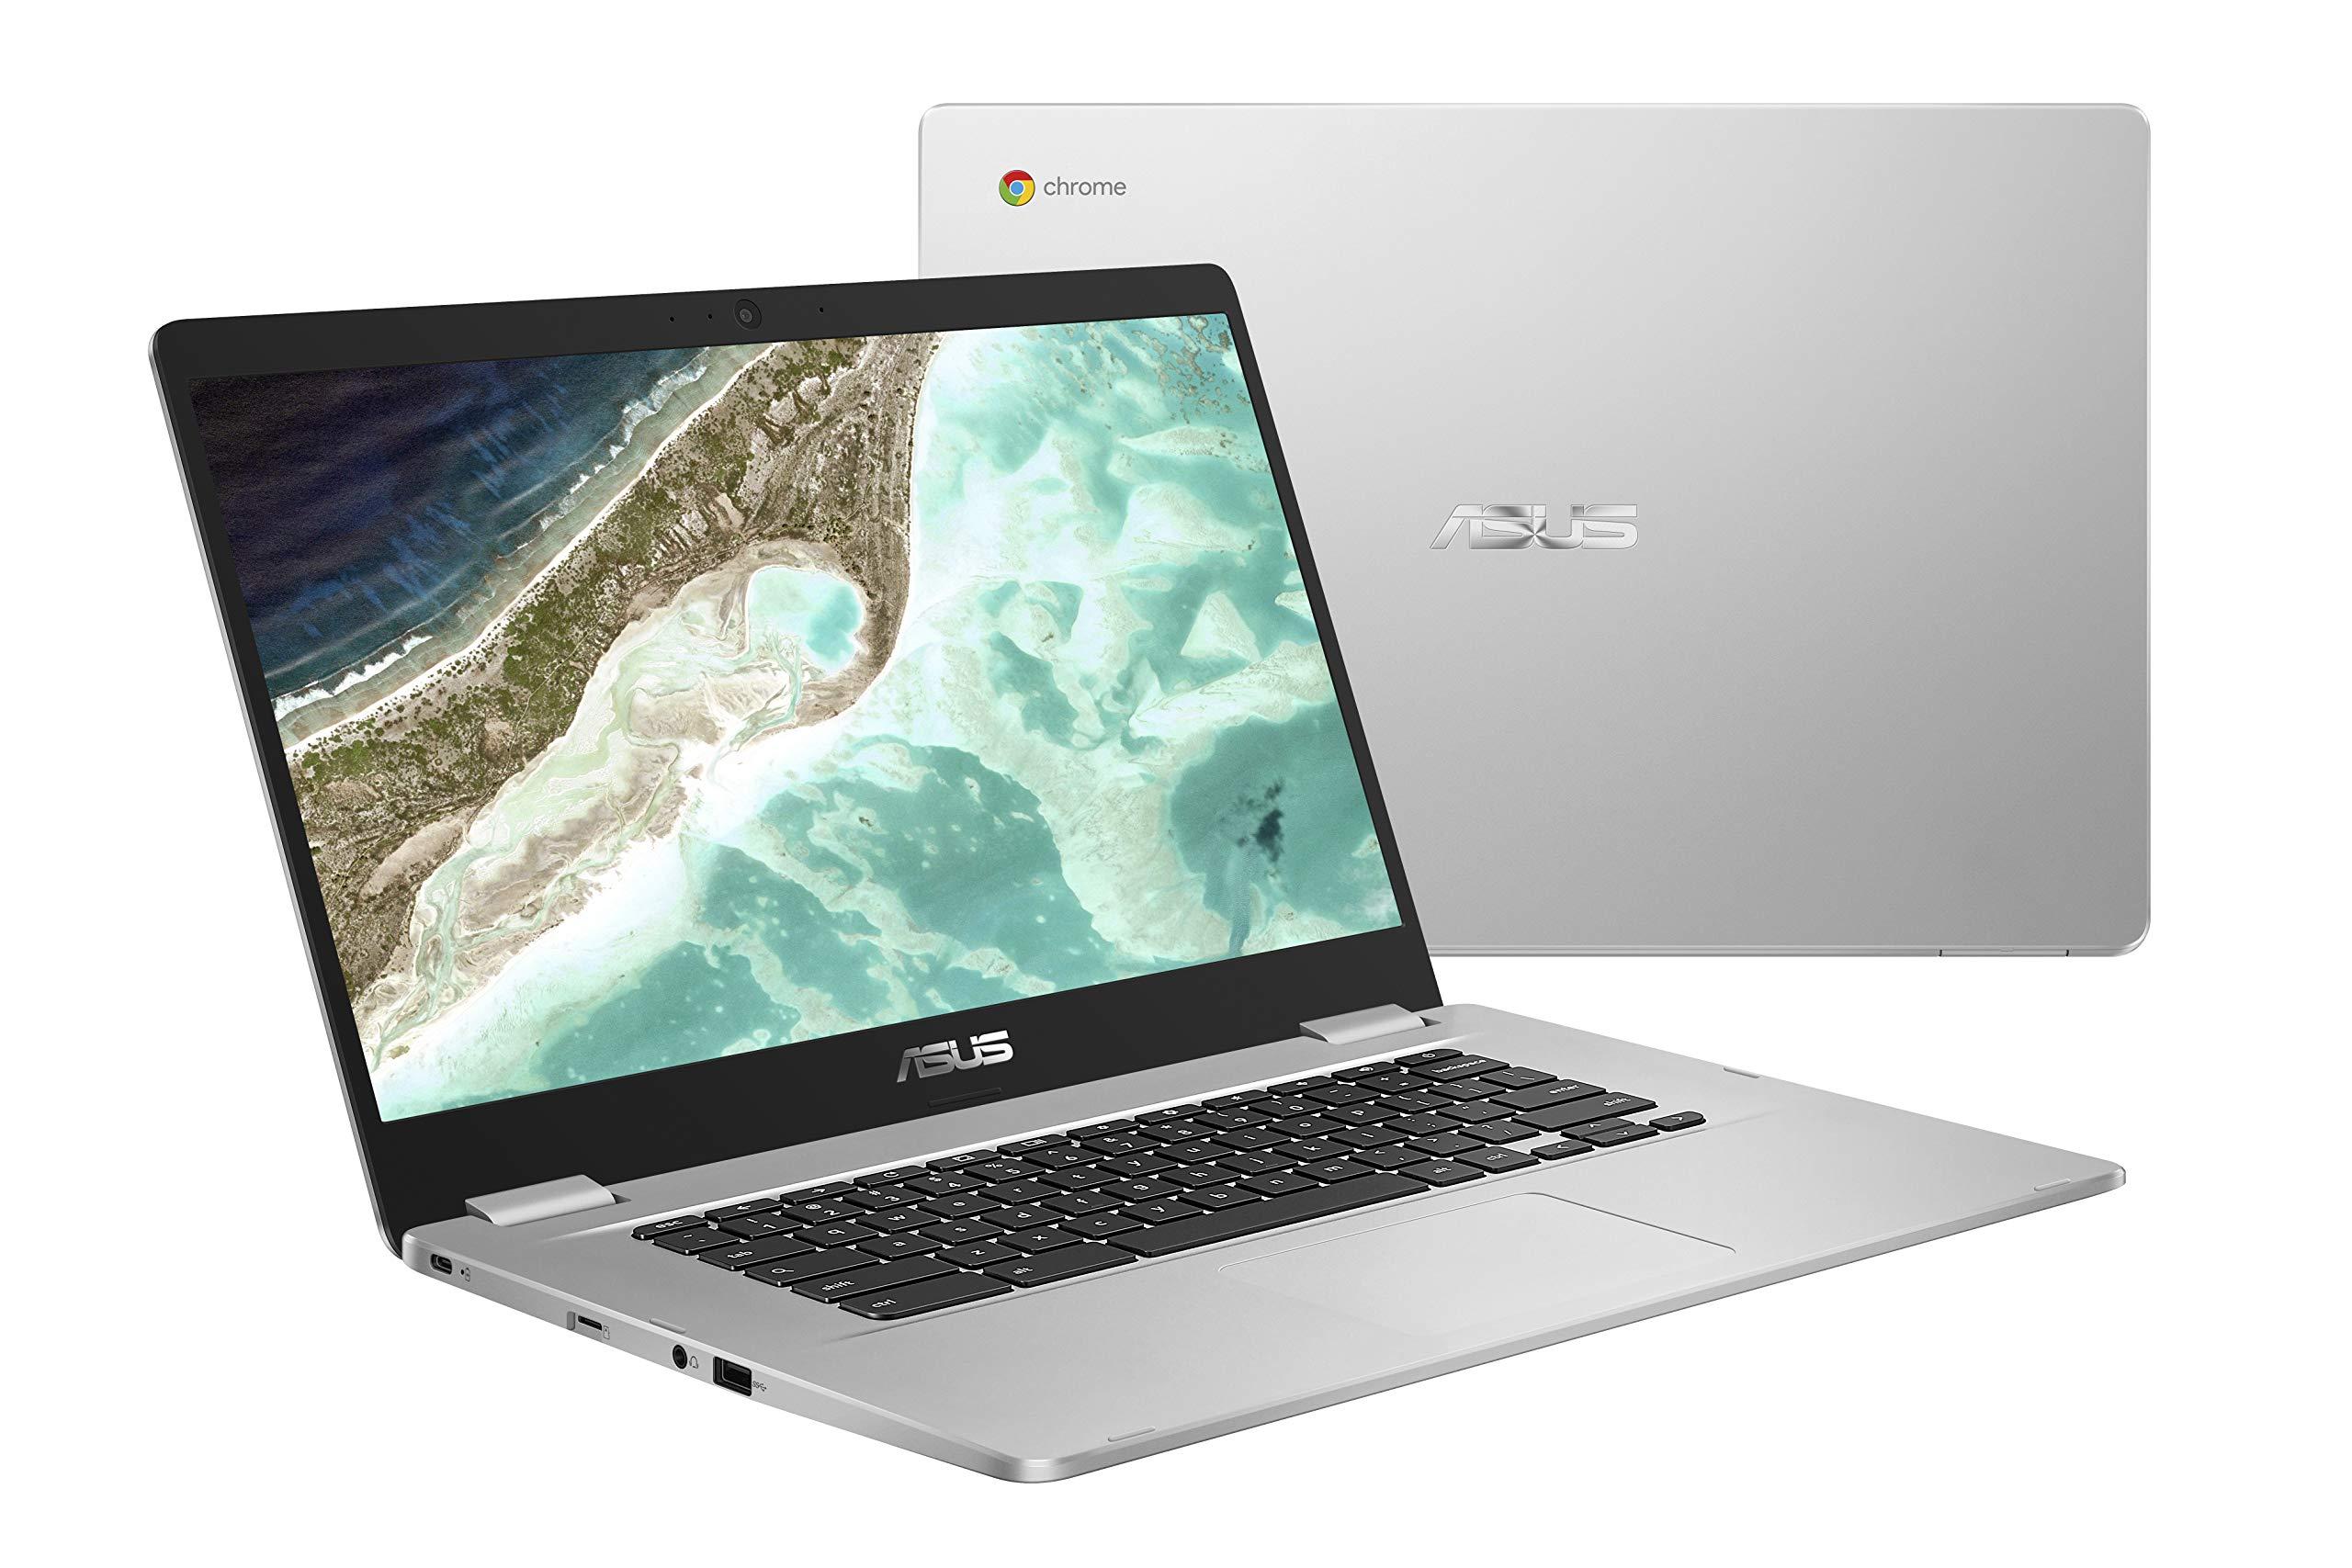 ASUS Chromebook C523NA-DH02 15.6'' HD NanoEdge Display, 180 Degree, Intel Dual Core Celeron Processor, 4GB RAM, 32GB eMMC Storage, Silver Color